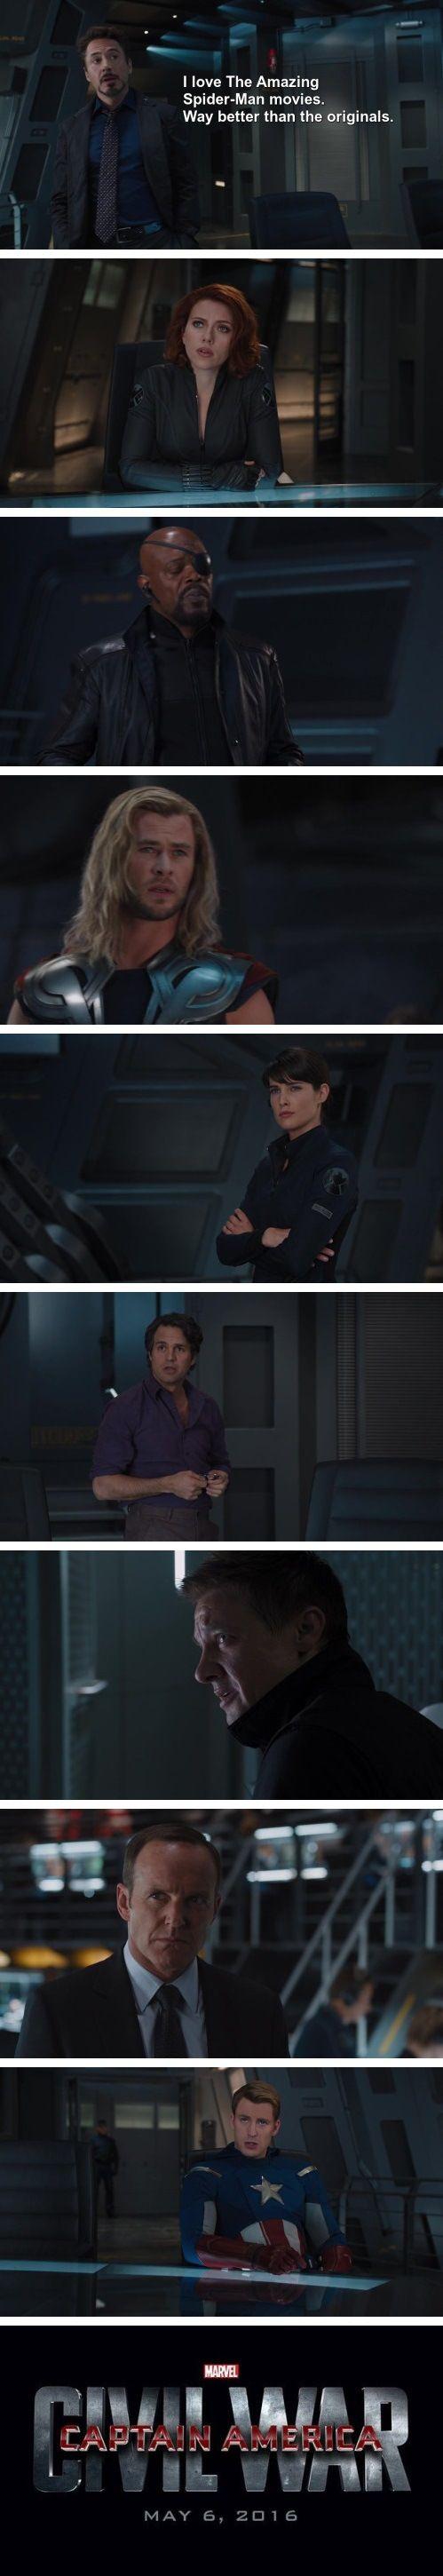 captain-america-civil-war-memes-iron-man-tony-stark-likes-the-amazing-spider-man